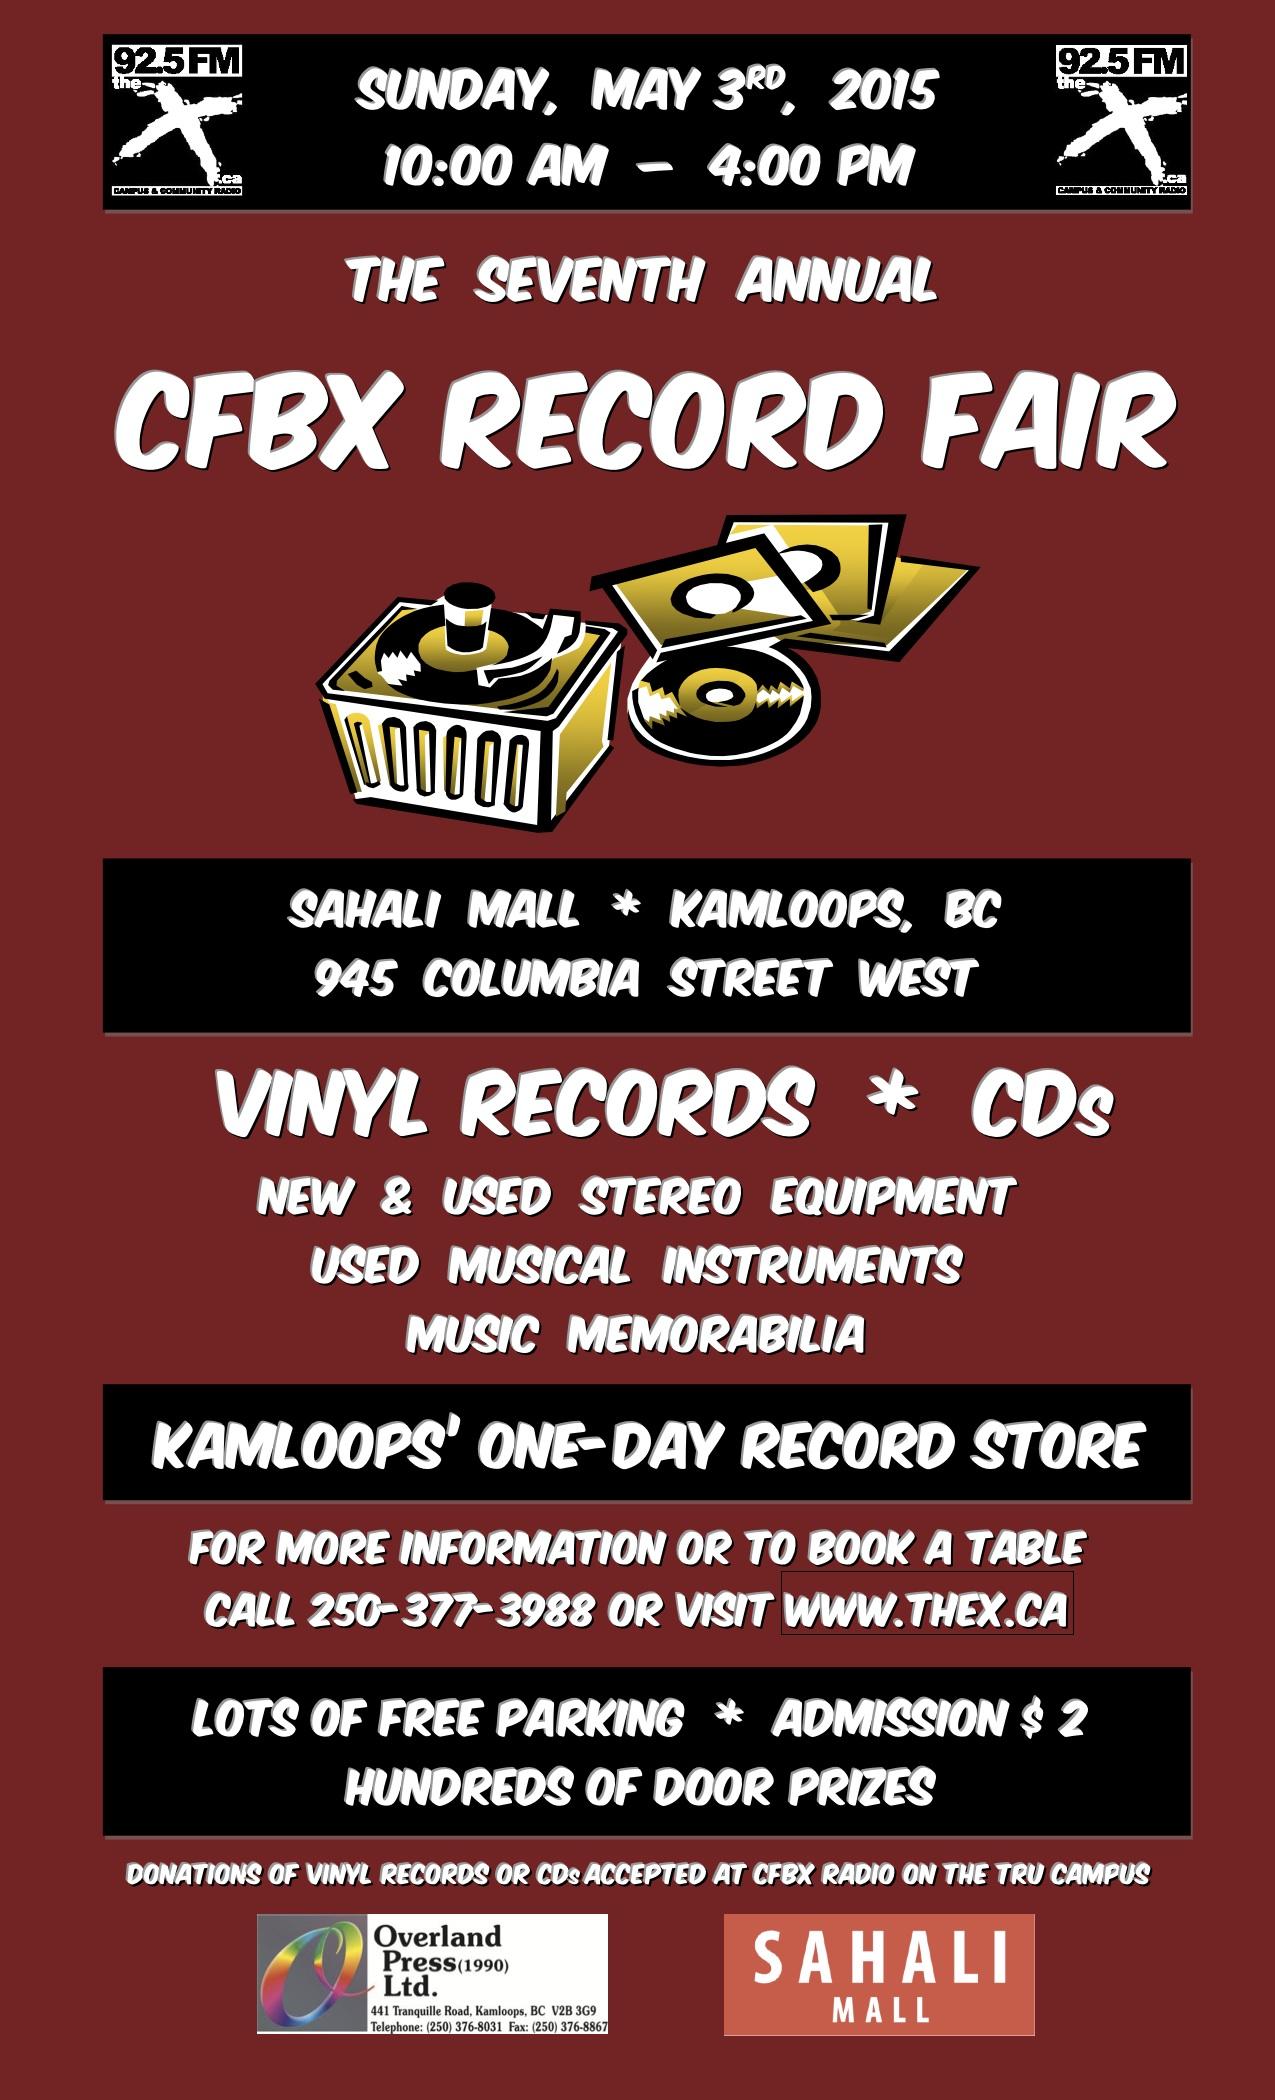 CFBX Record Fair 2015 Poster